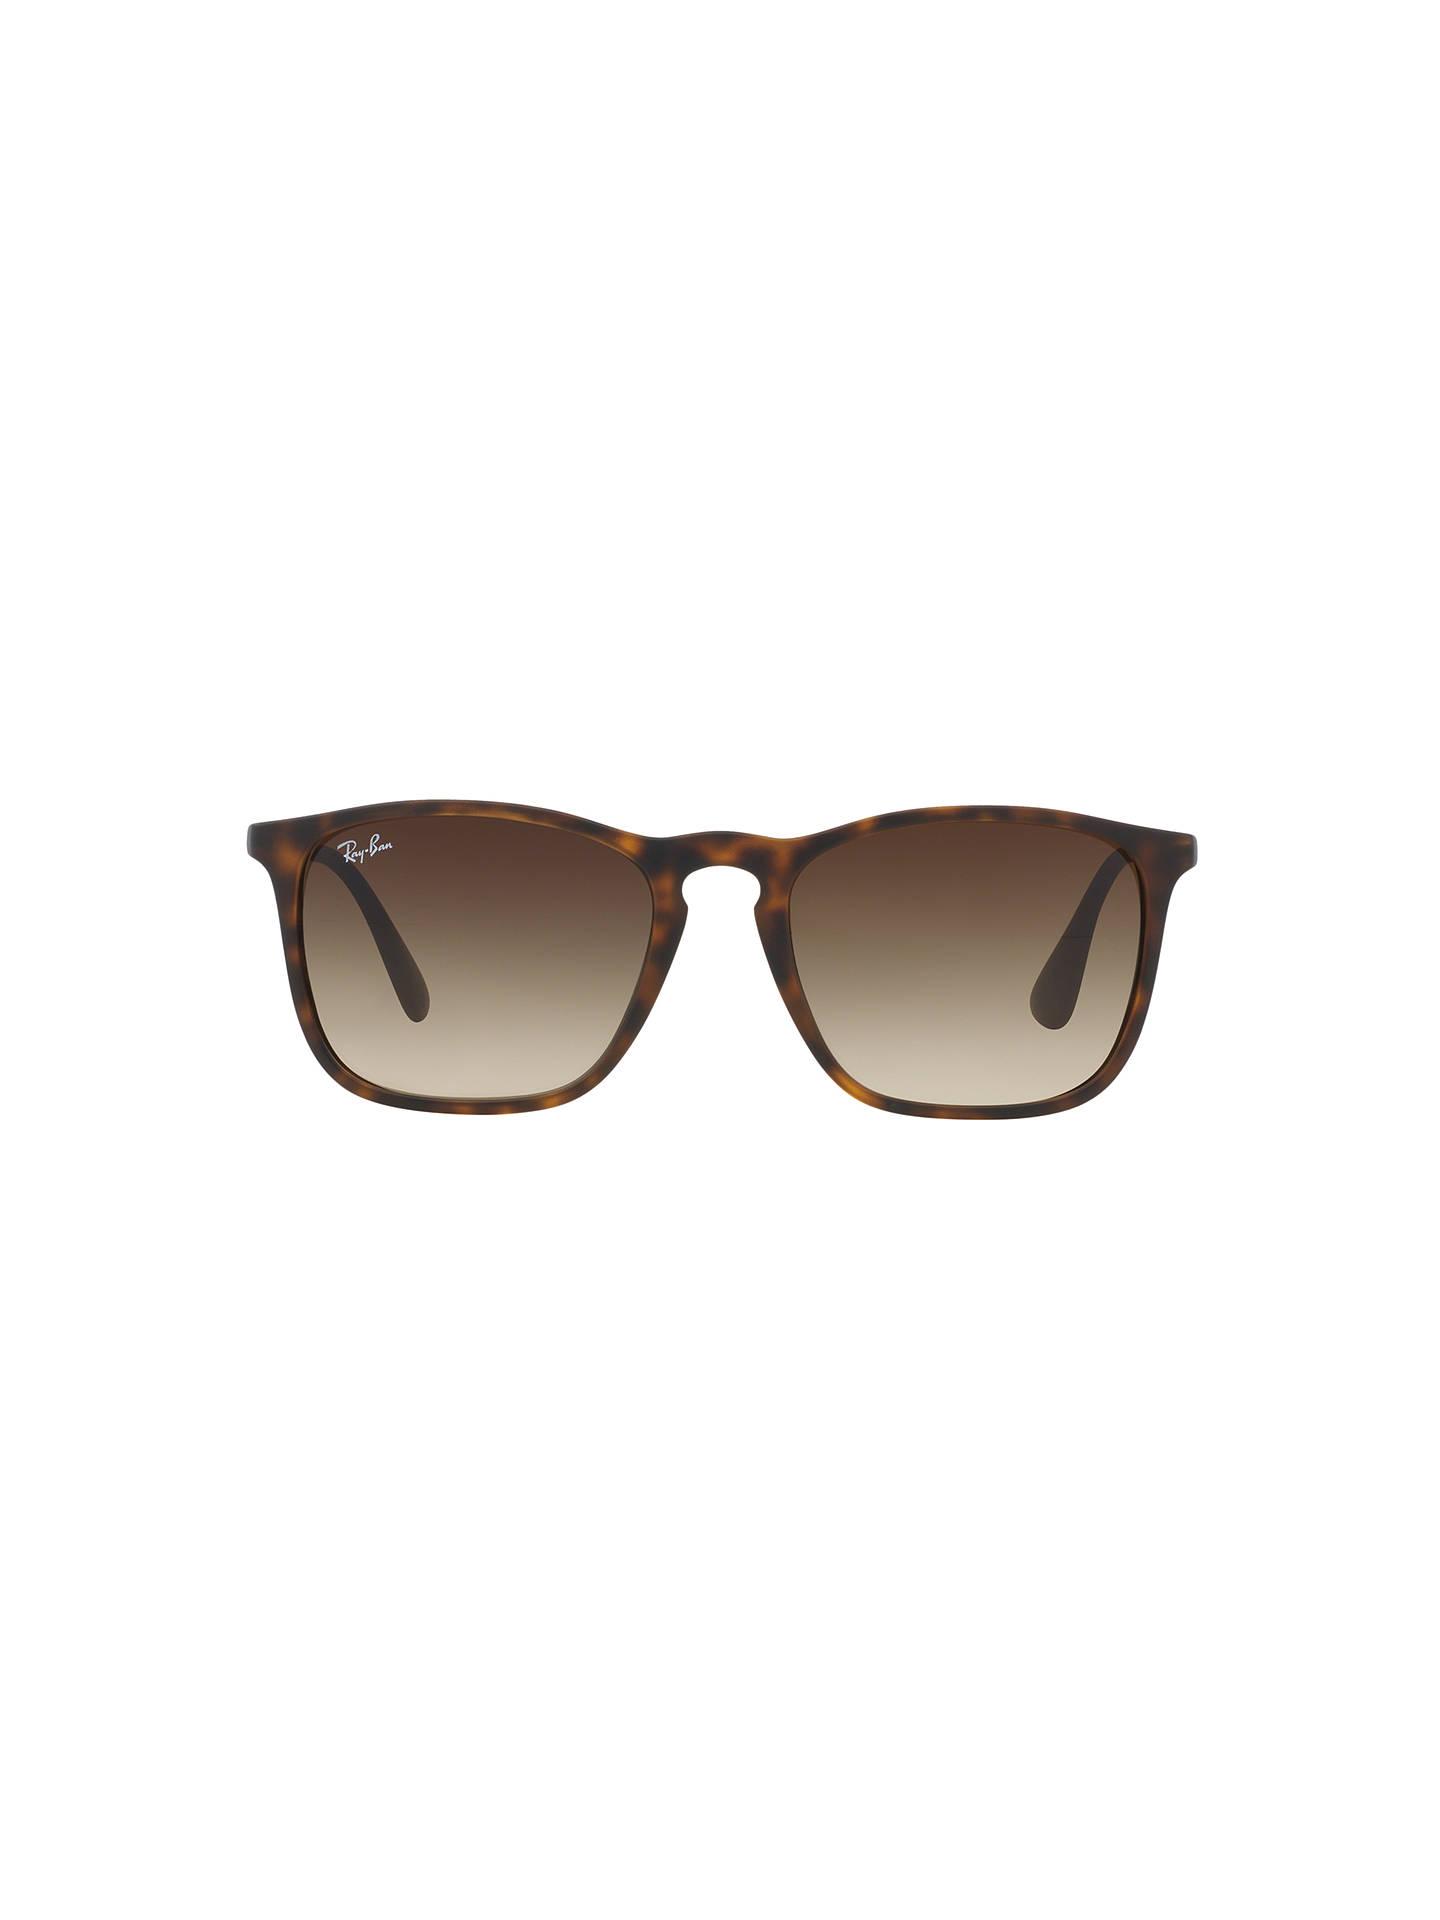 d27587db93e Ray-Ban RB4187 Chris Square Sunglasses at John Lewis   Partners